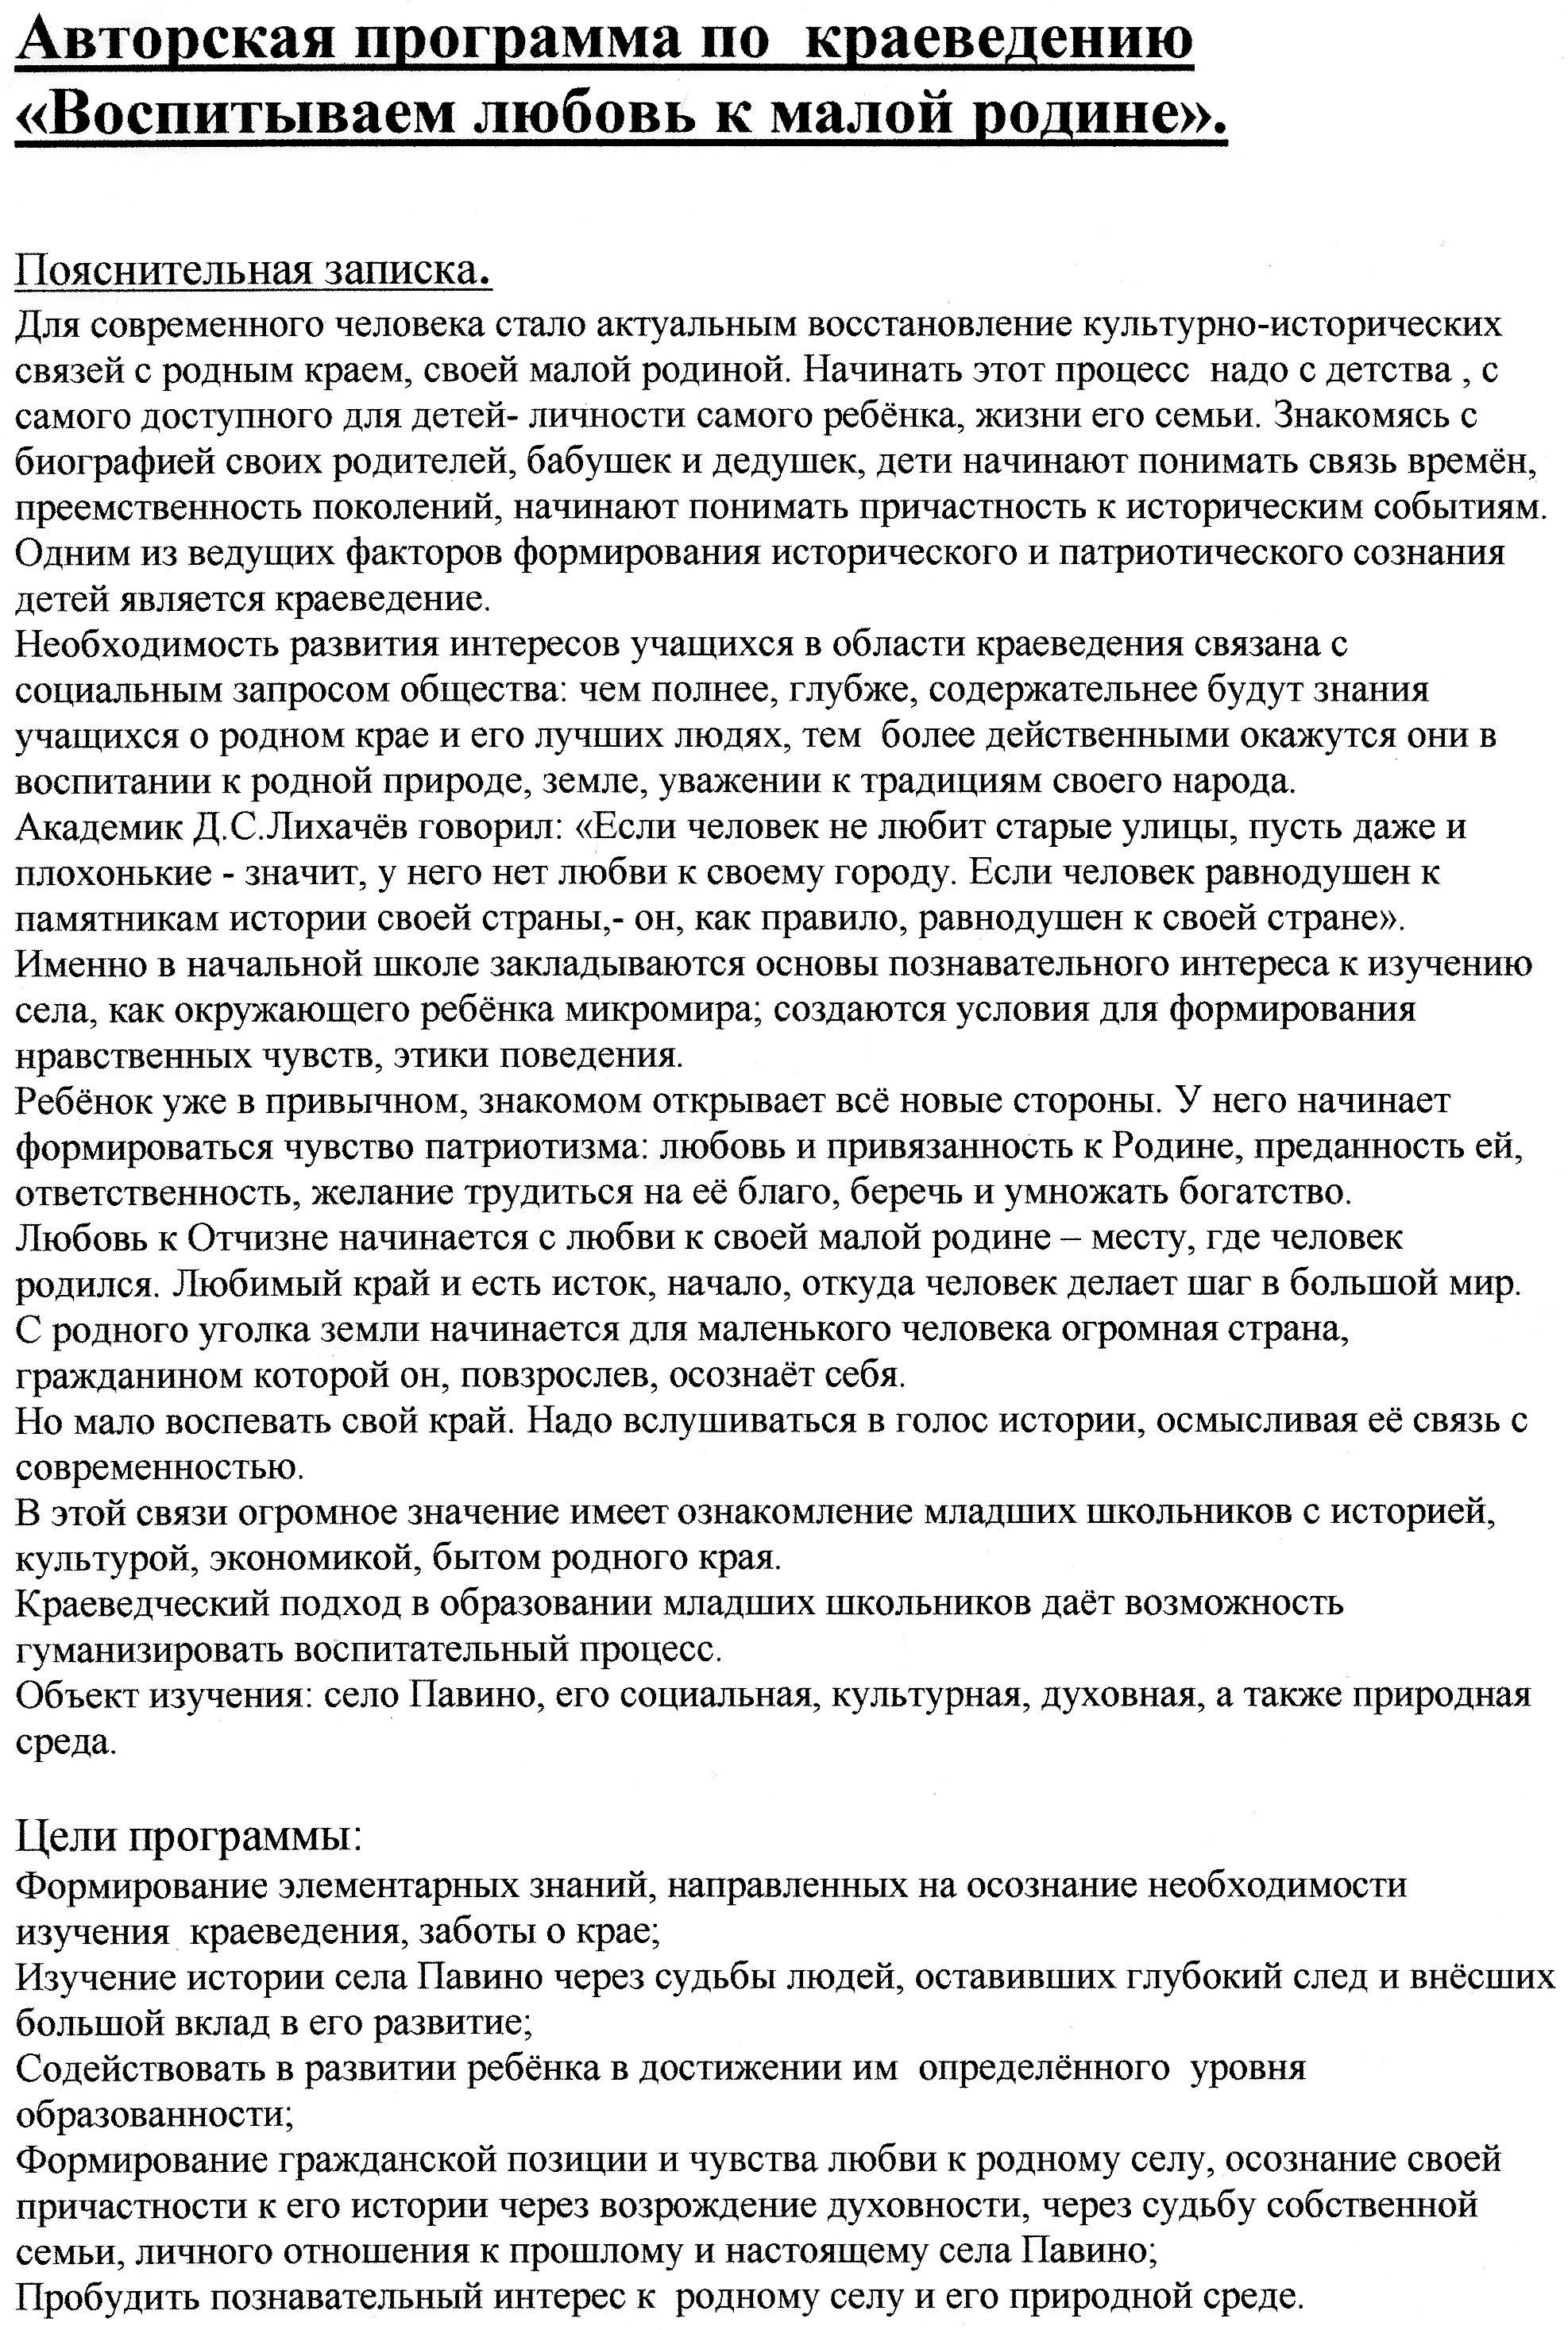 C:\Users\Владимир\Desktop\Новая папка (2)\img001.jpg